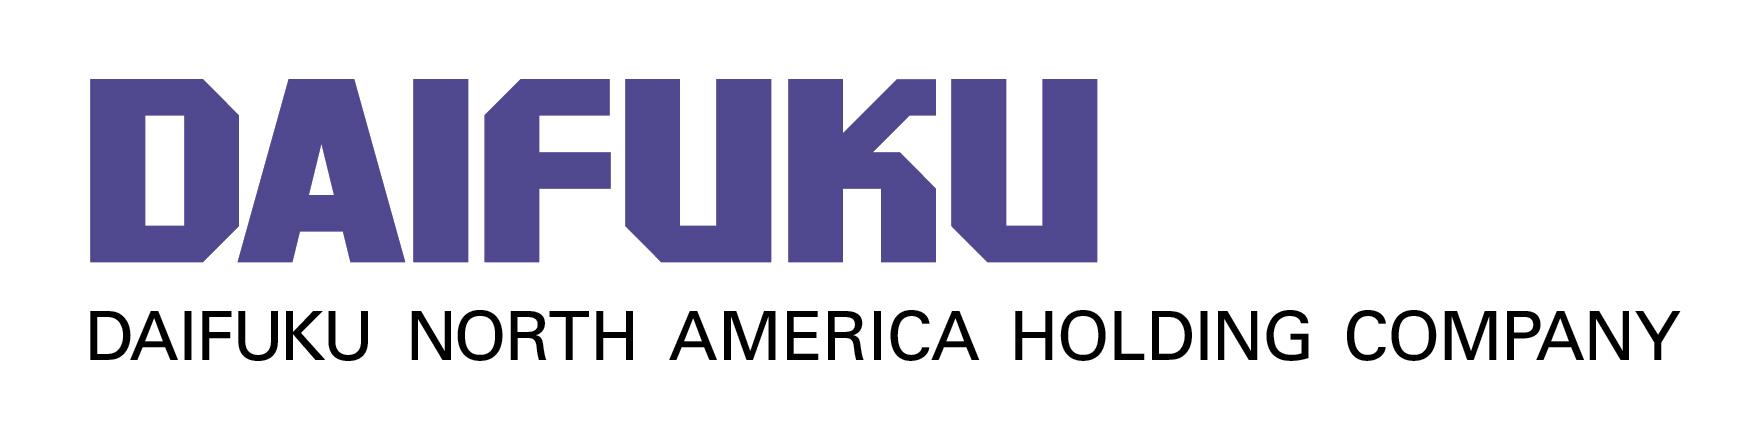 Daifuku North America Holding Company logo